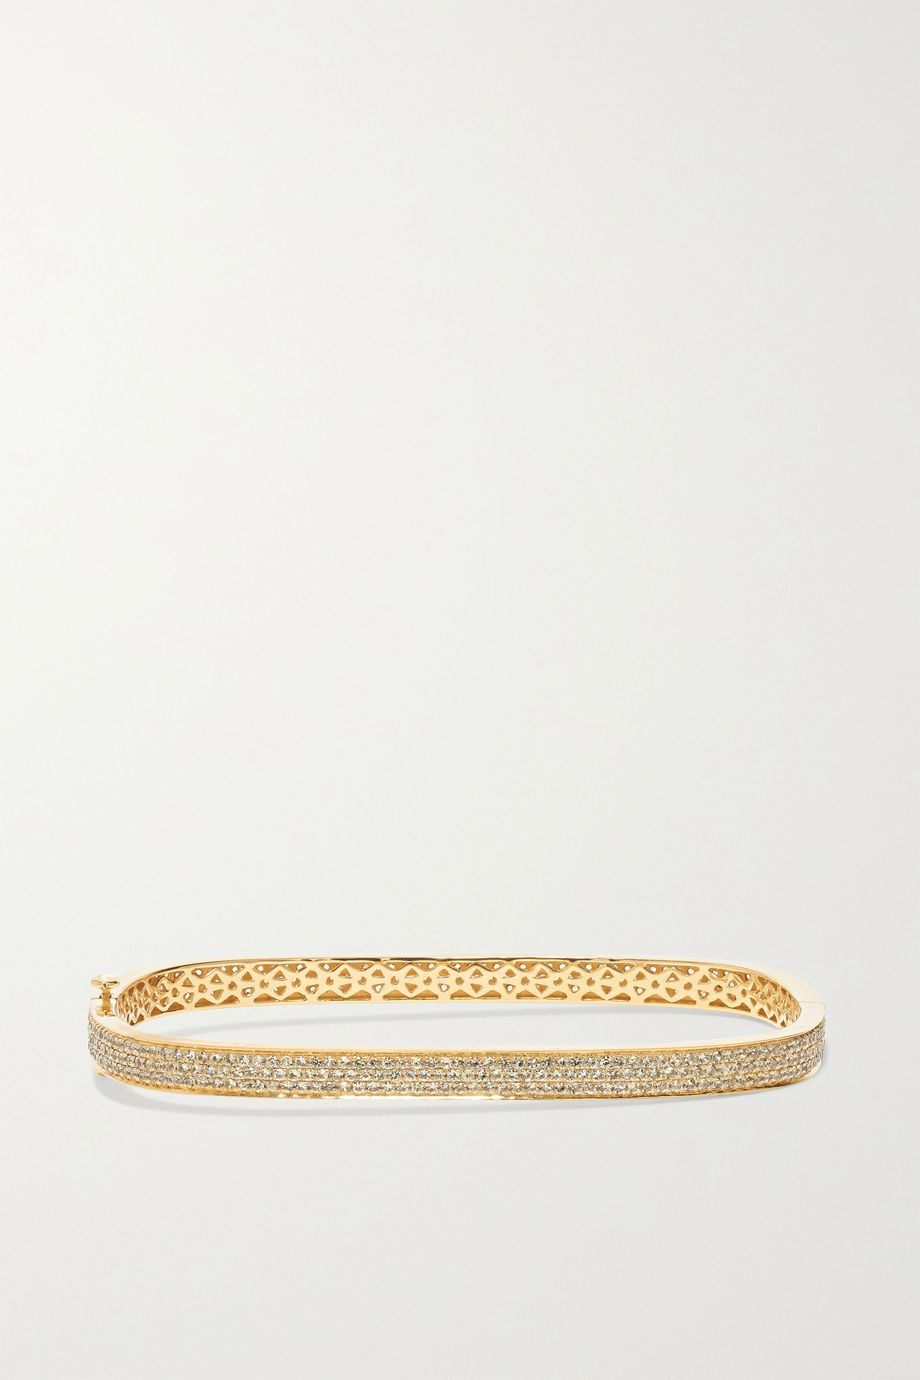 OFIRA Bracelet en or 18 carats et saphirs Geo